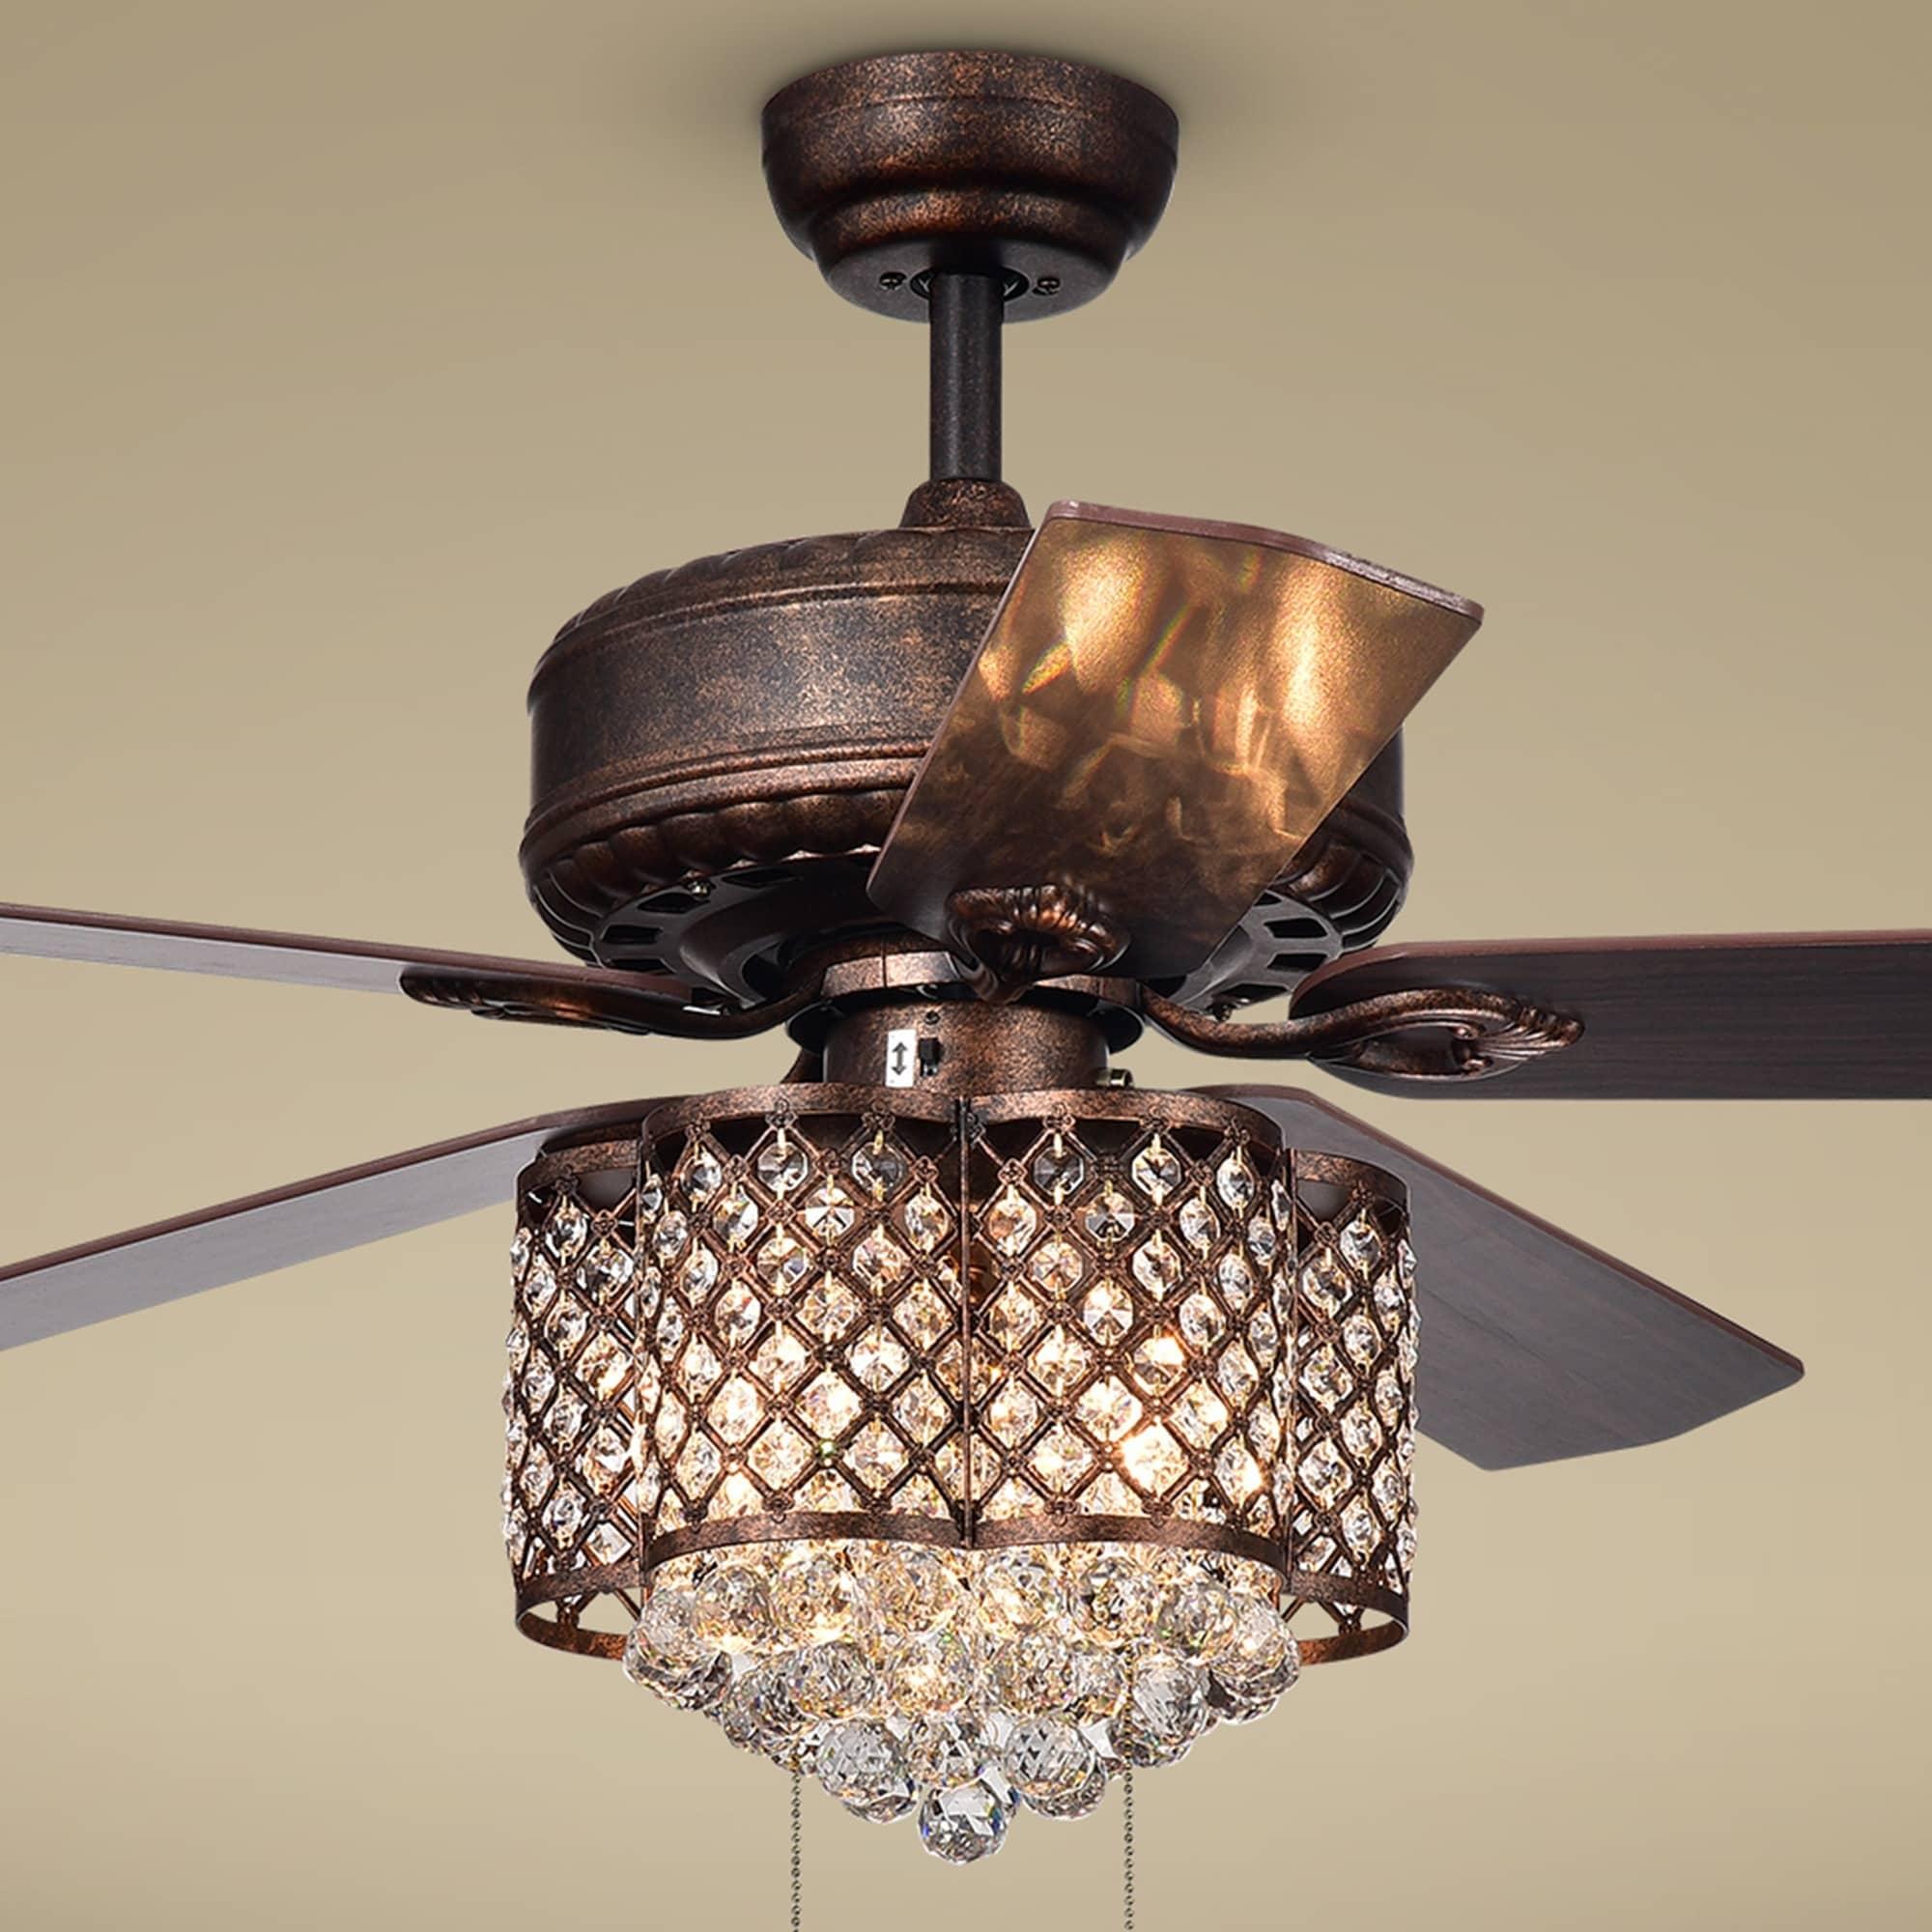 Pshita 3 light Crystal 5 blade 52 inch Rustic Bronze Ceiling Fan